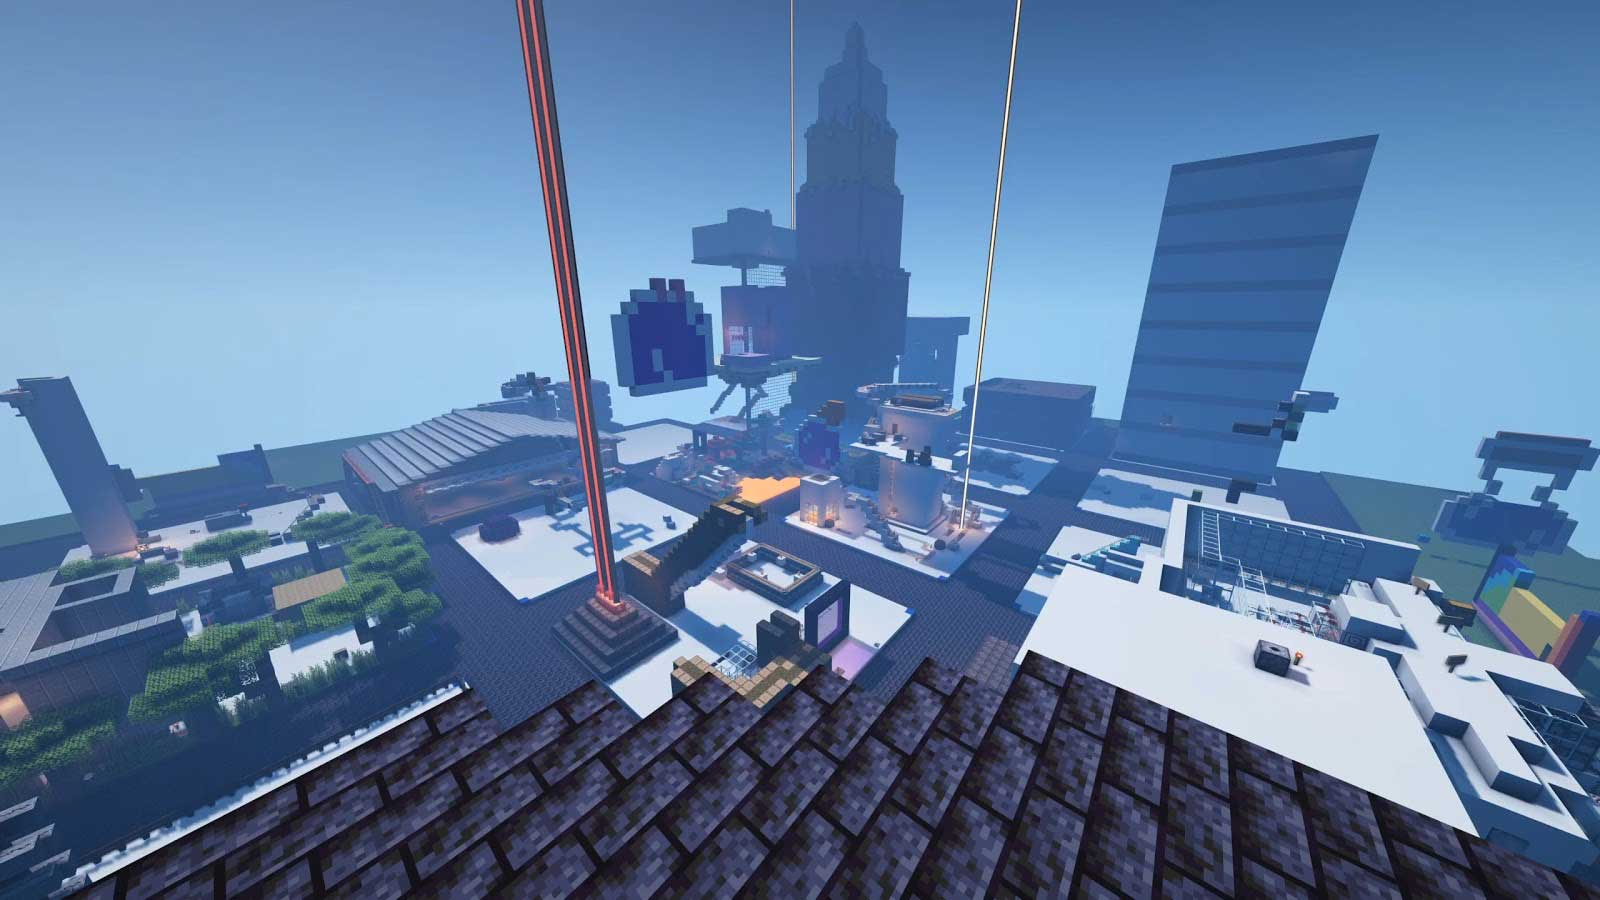 Student2Student-Minecraft-ScienceCraft_Structures